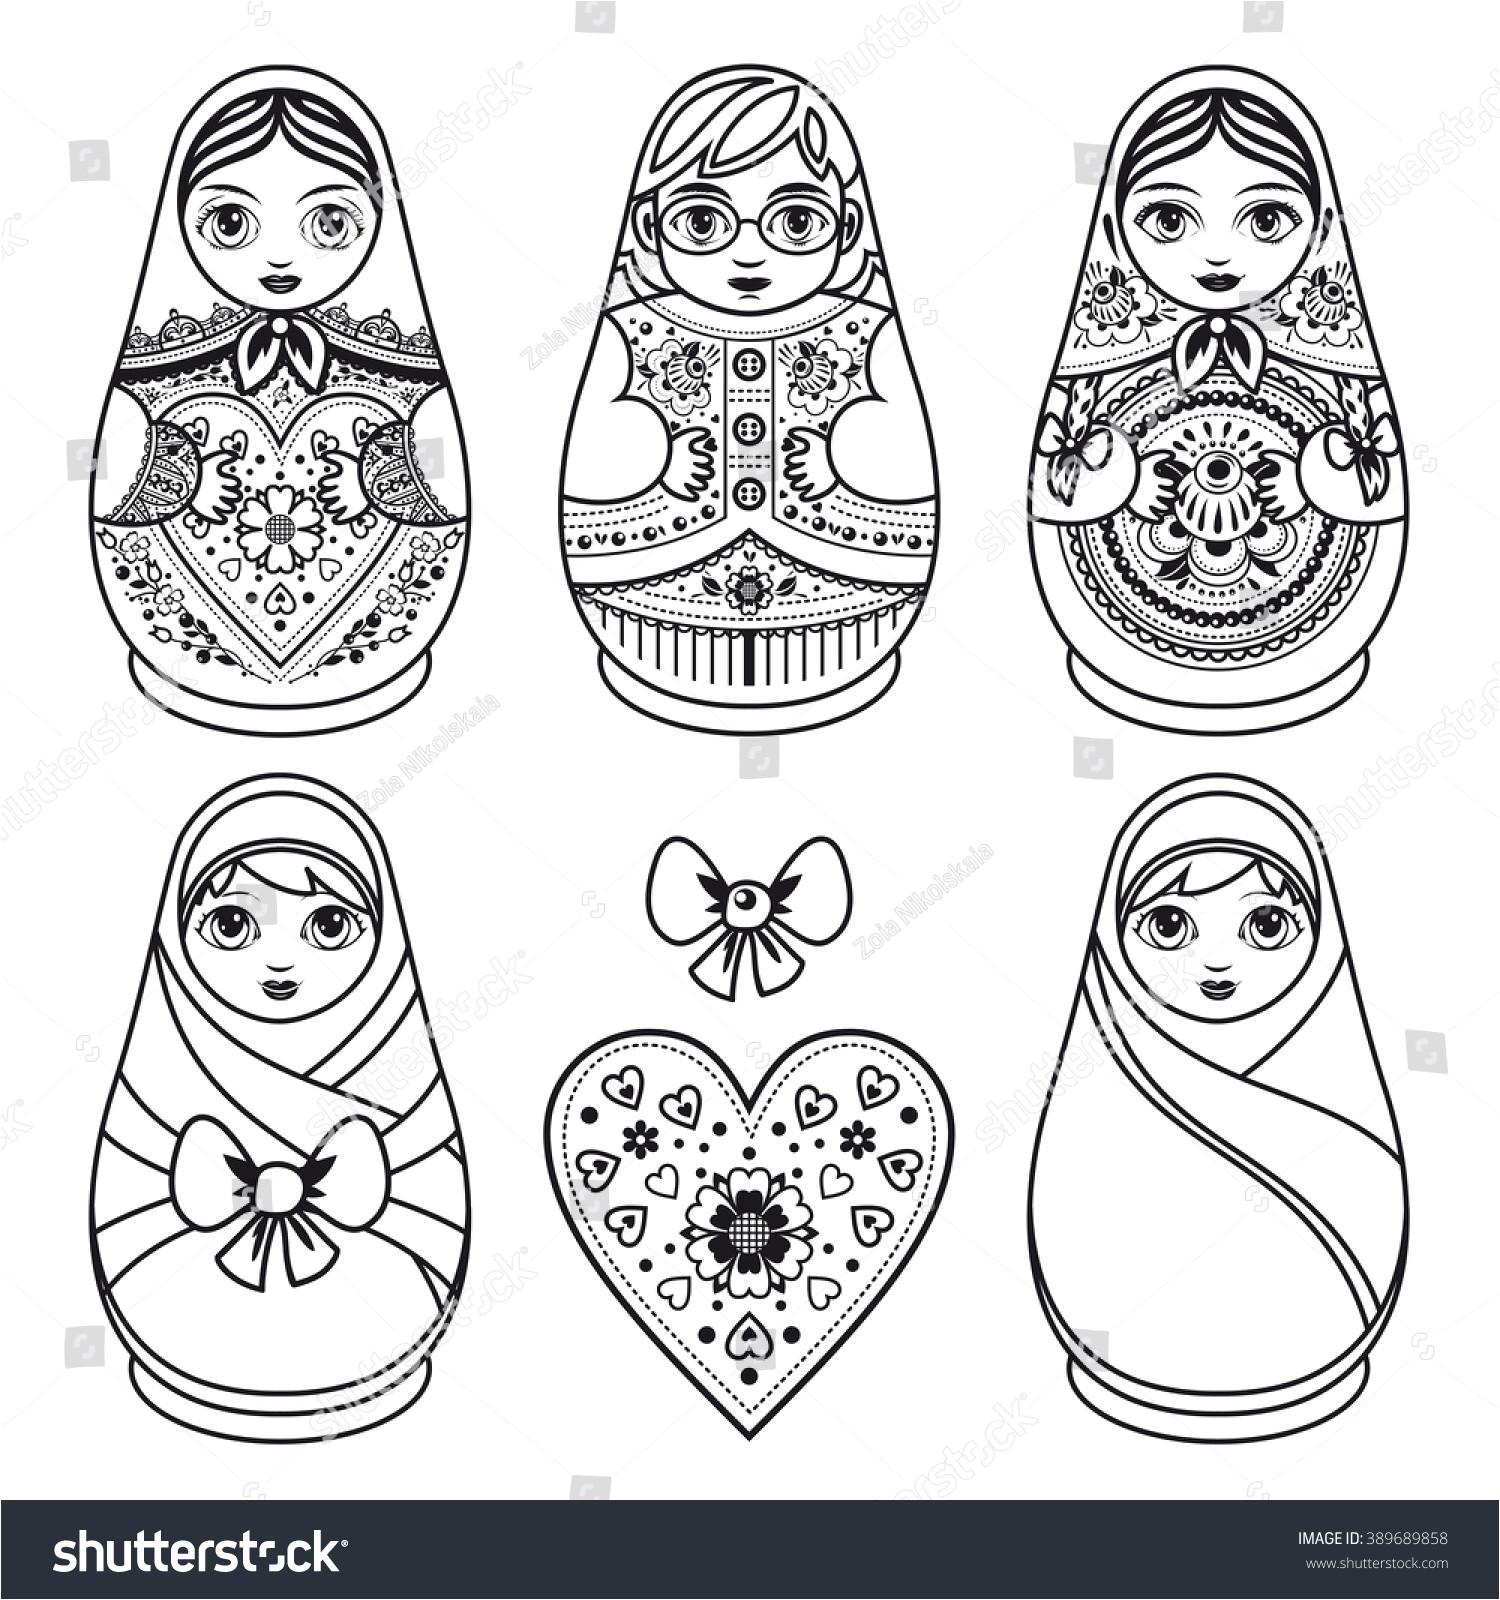 Russian Nesting Dolls Template Matryoshka Russian Folk Nesting Doll Babushka Doll